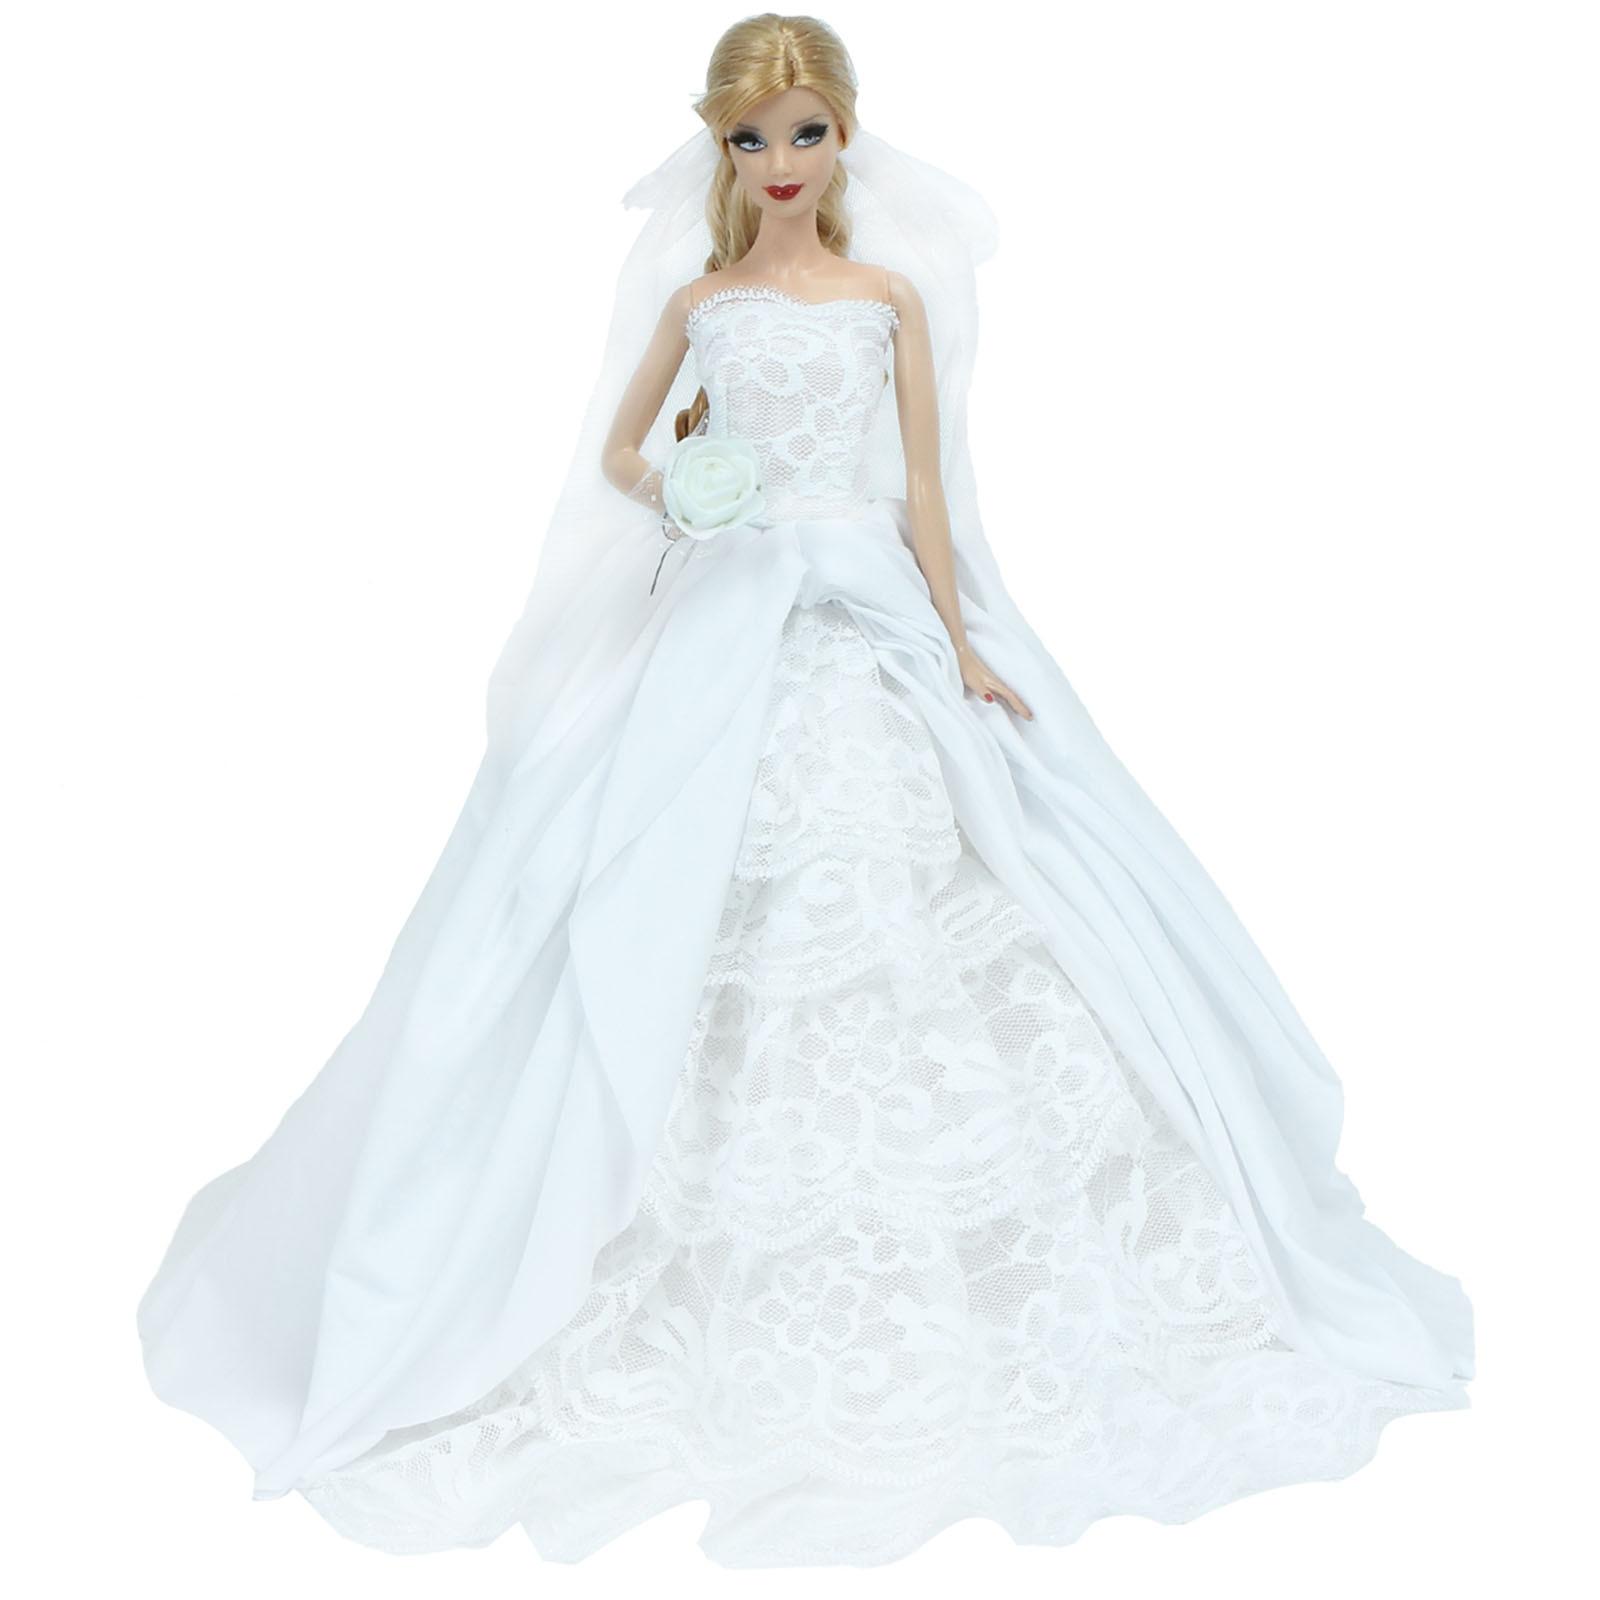 High Quality Wedding Party Dress Pengantin Rok Princess Gown Dengan Veil Fesyen Aksesoris Perkahwinan Pakaian Untuk Toy Doll Barbie